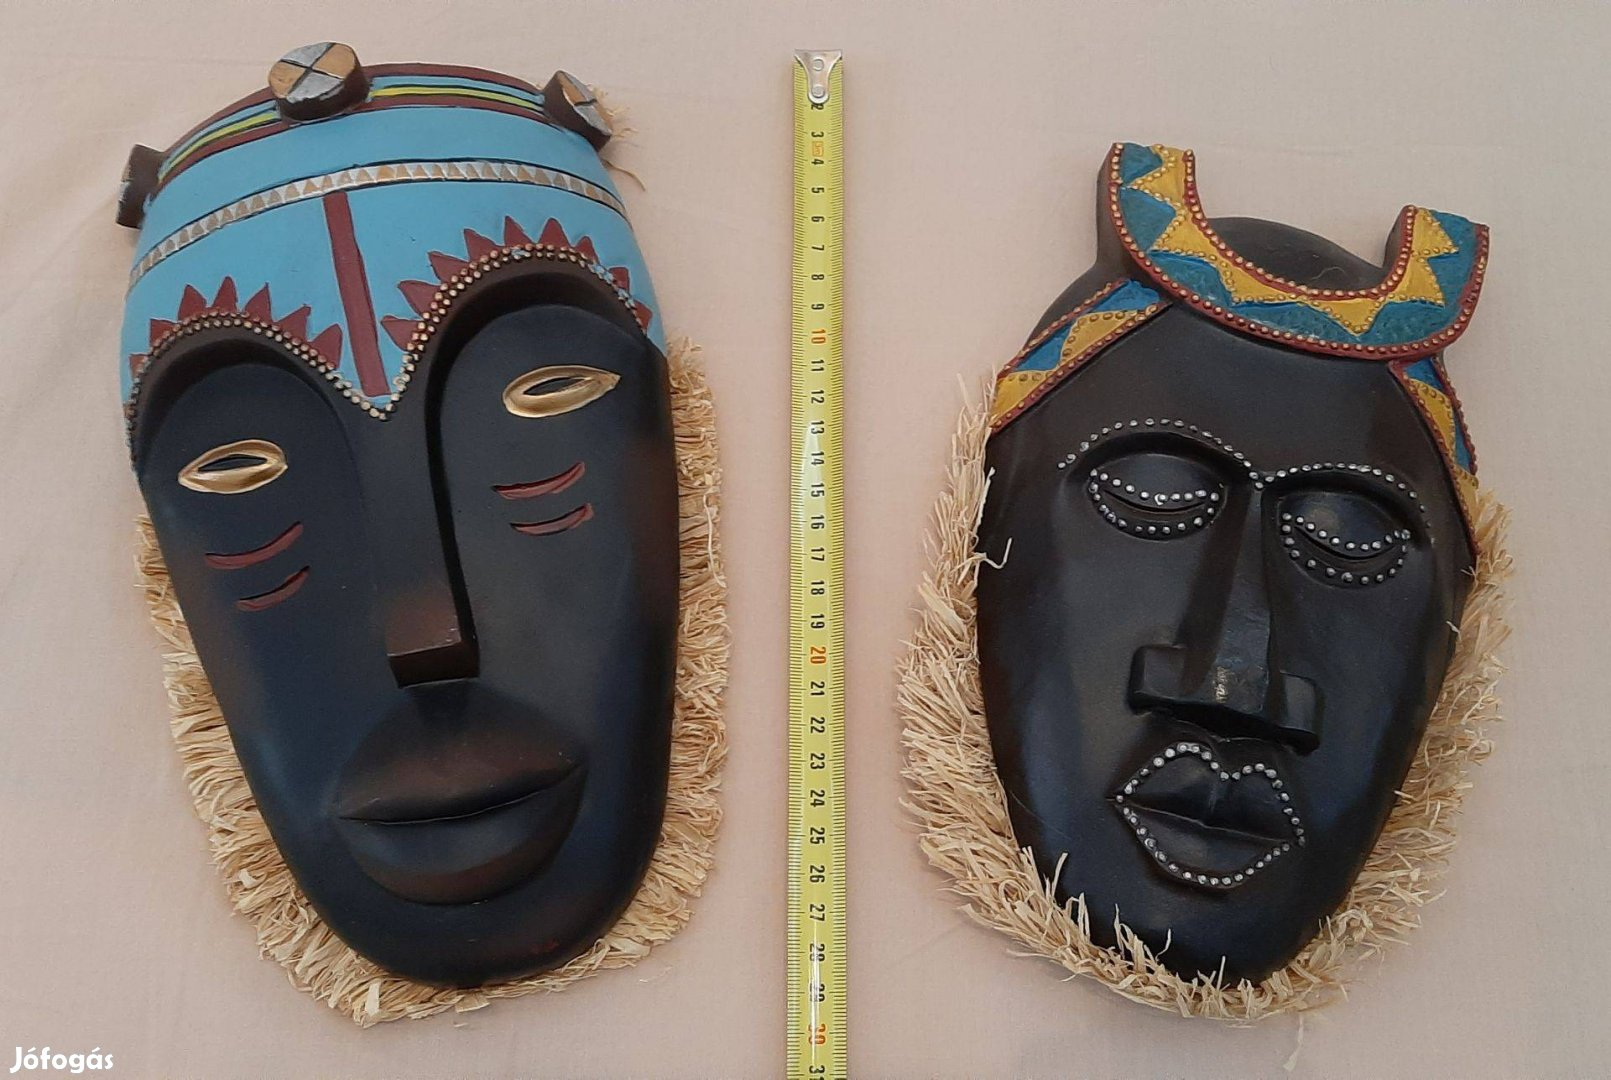 Etnico maszk-ok